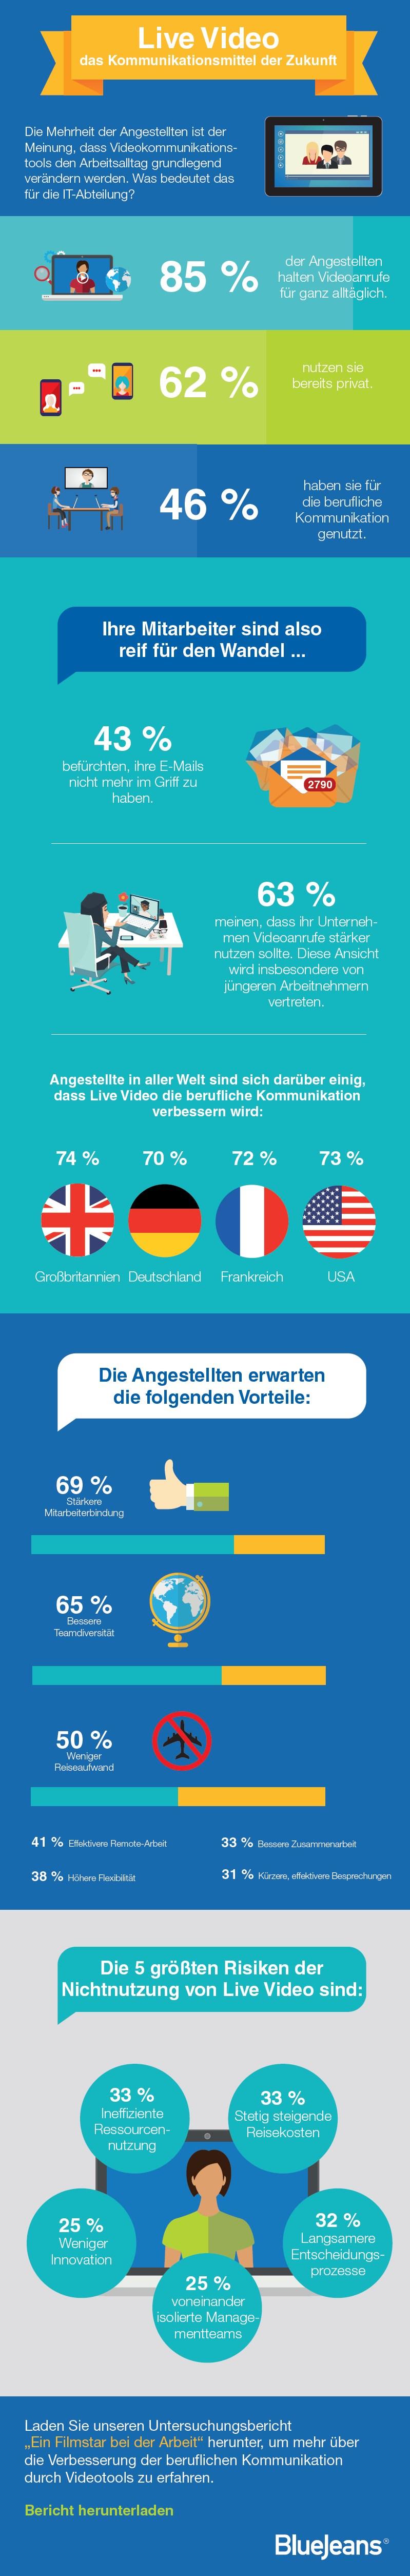 infografik bluejeans videokonferenz